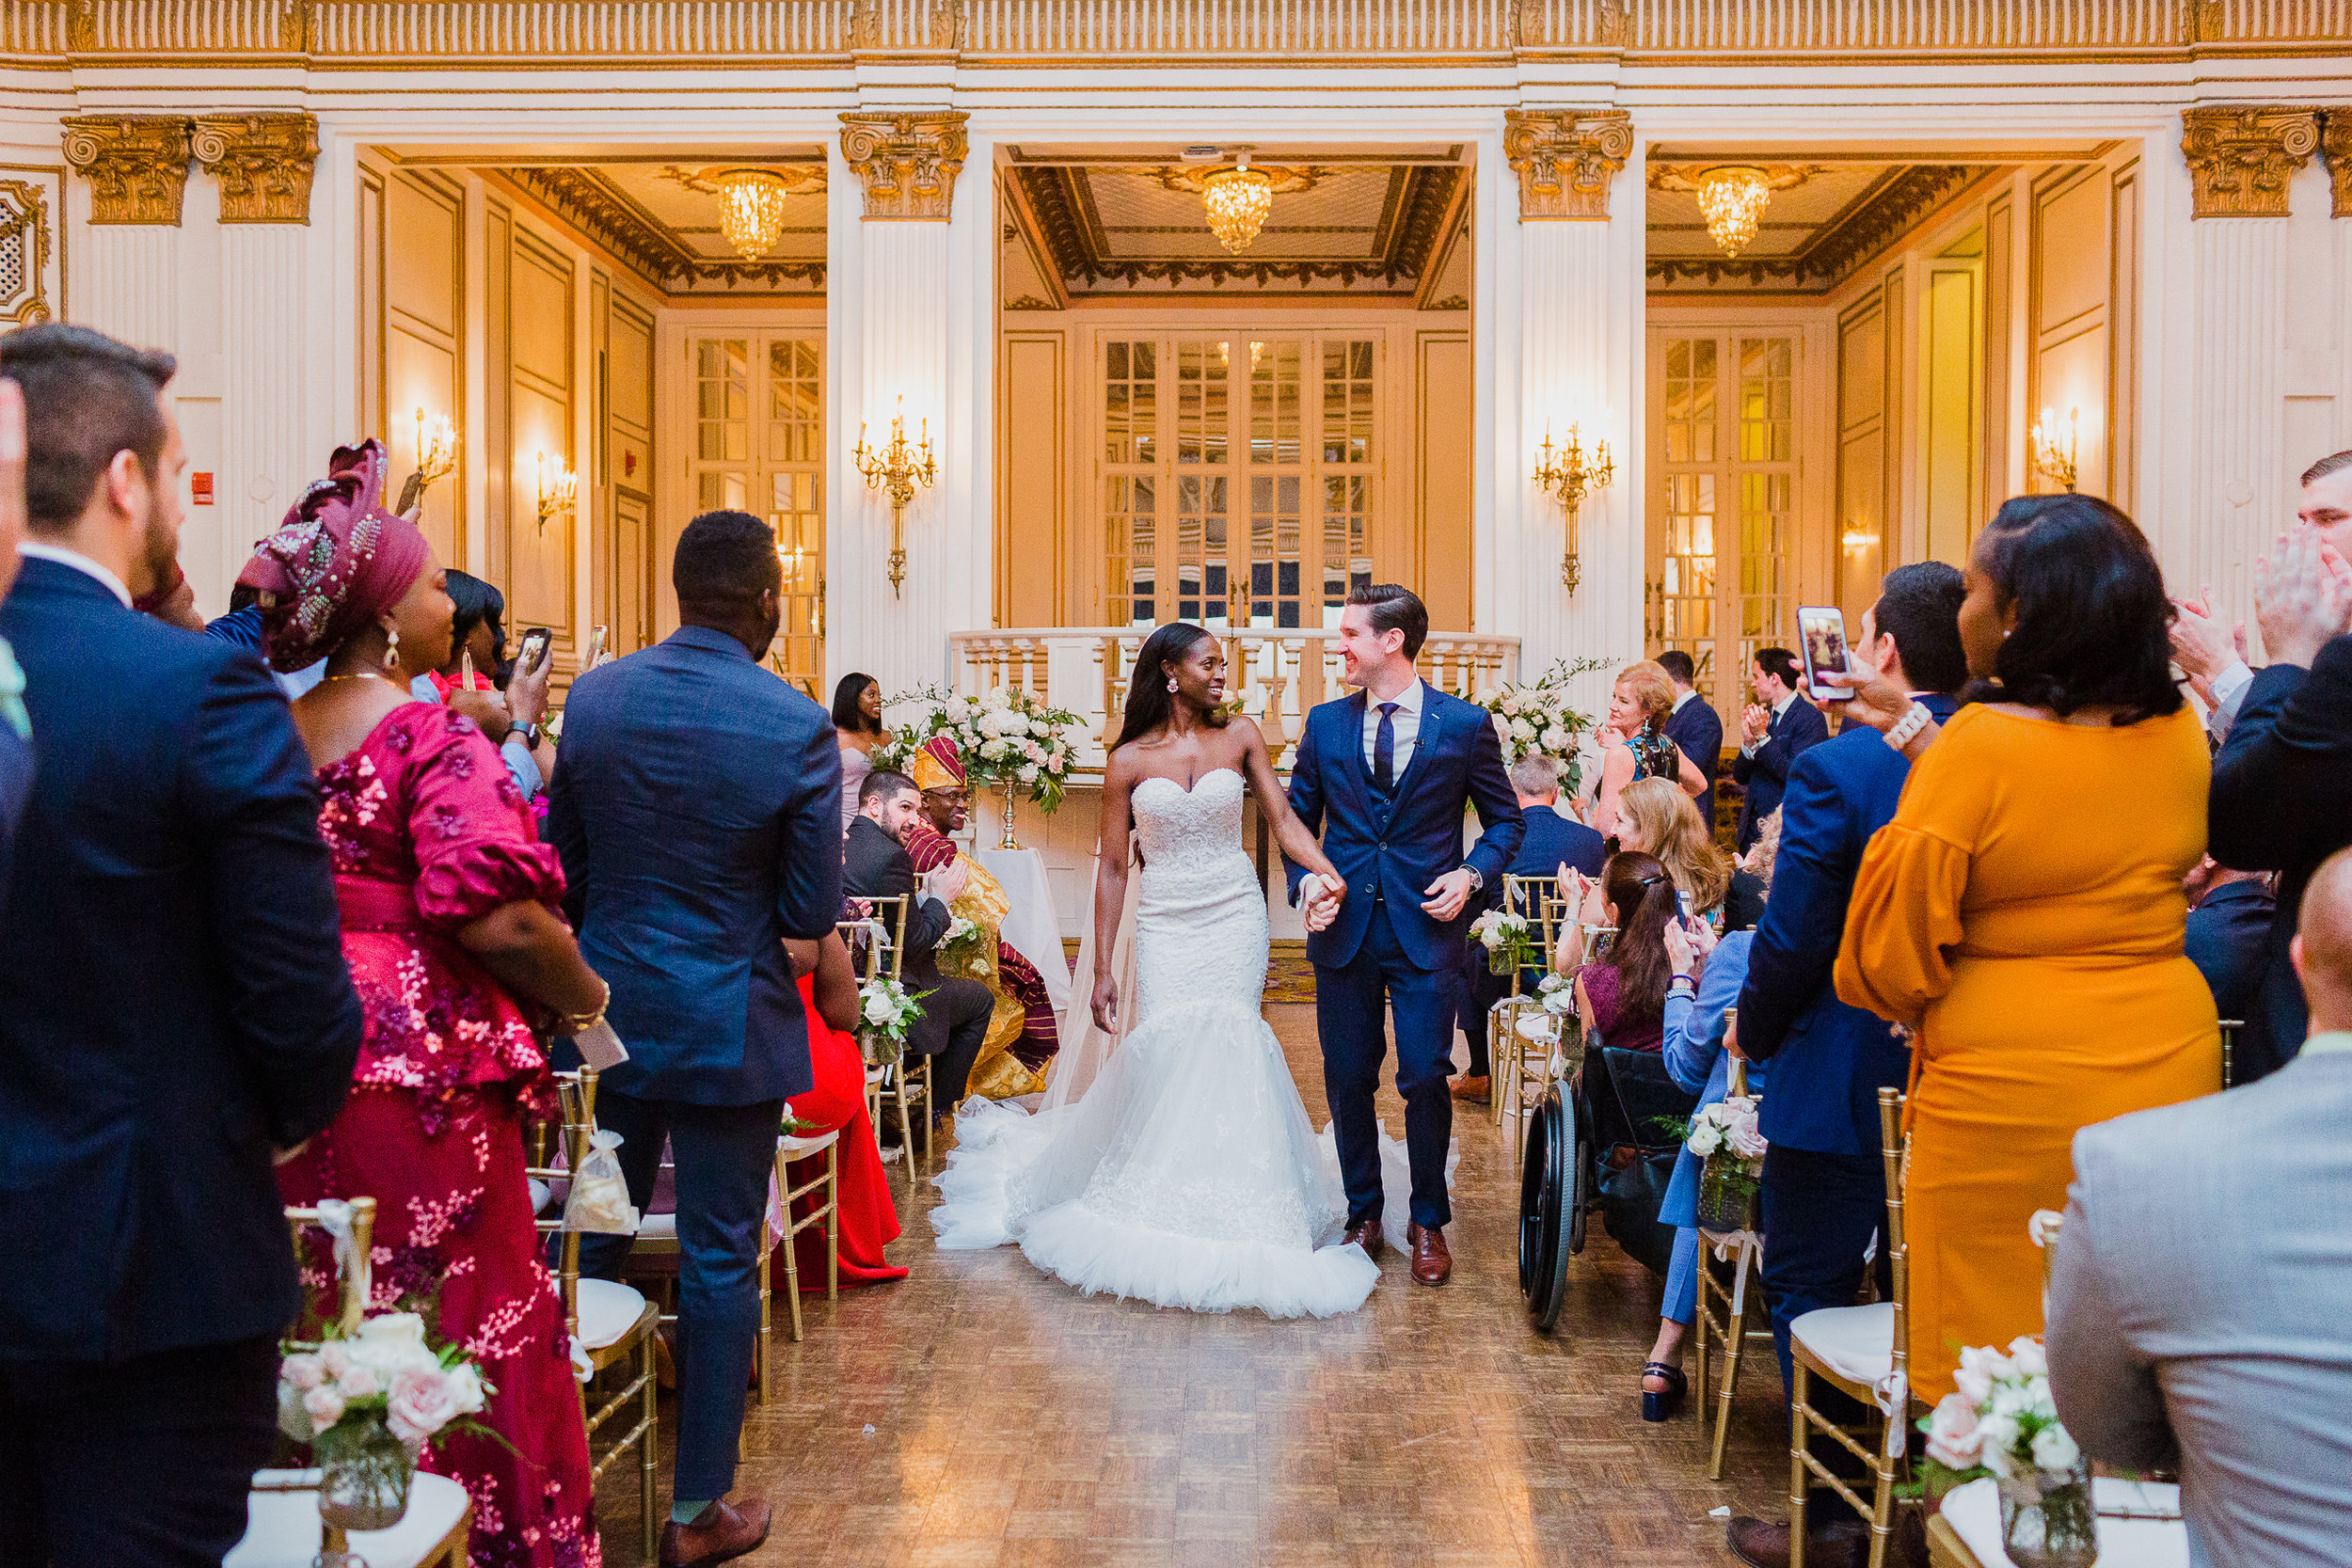 fairmont-copley-plaza-wedding-photos-00745.JPG